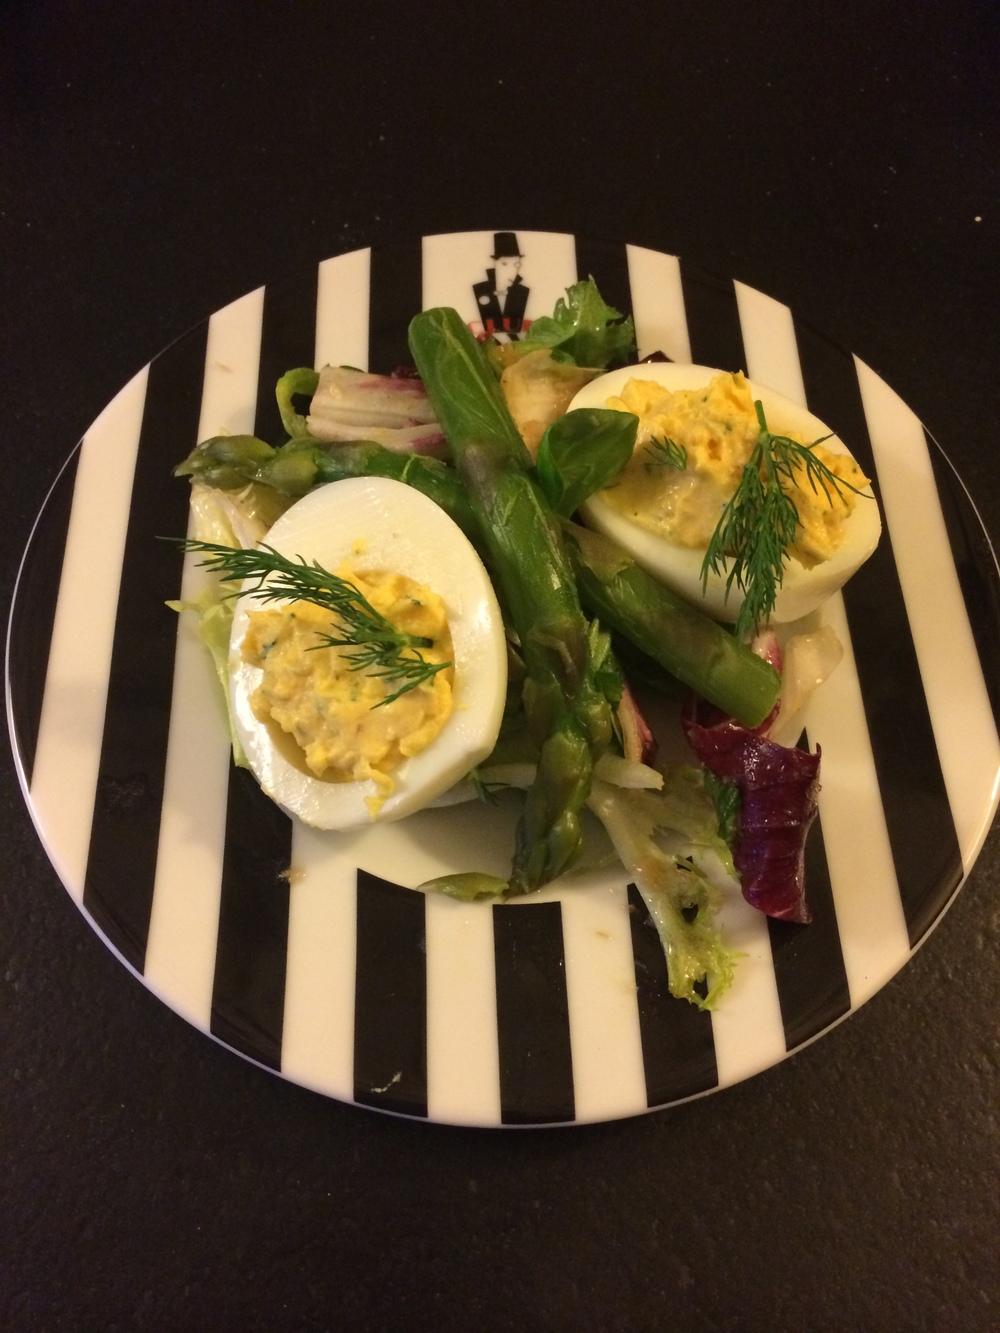 Oeuf diablo with asparagus vinaigrette